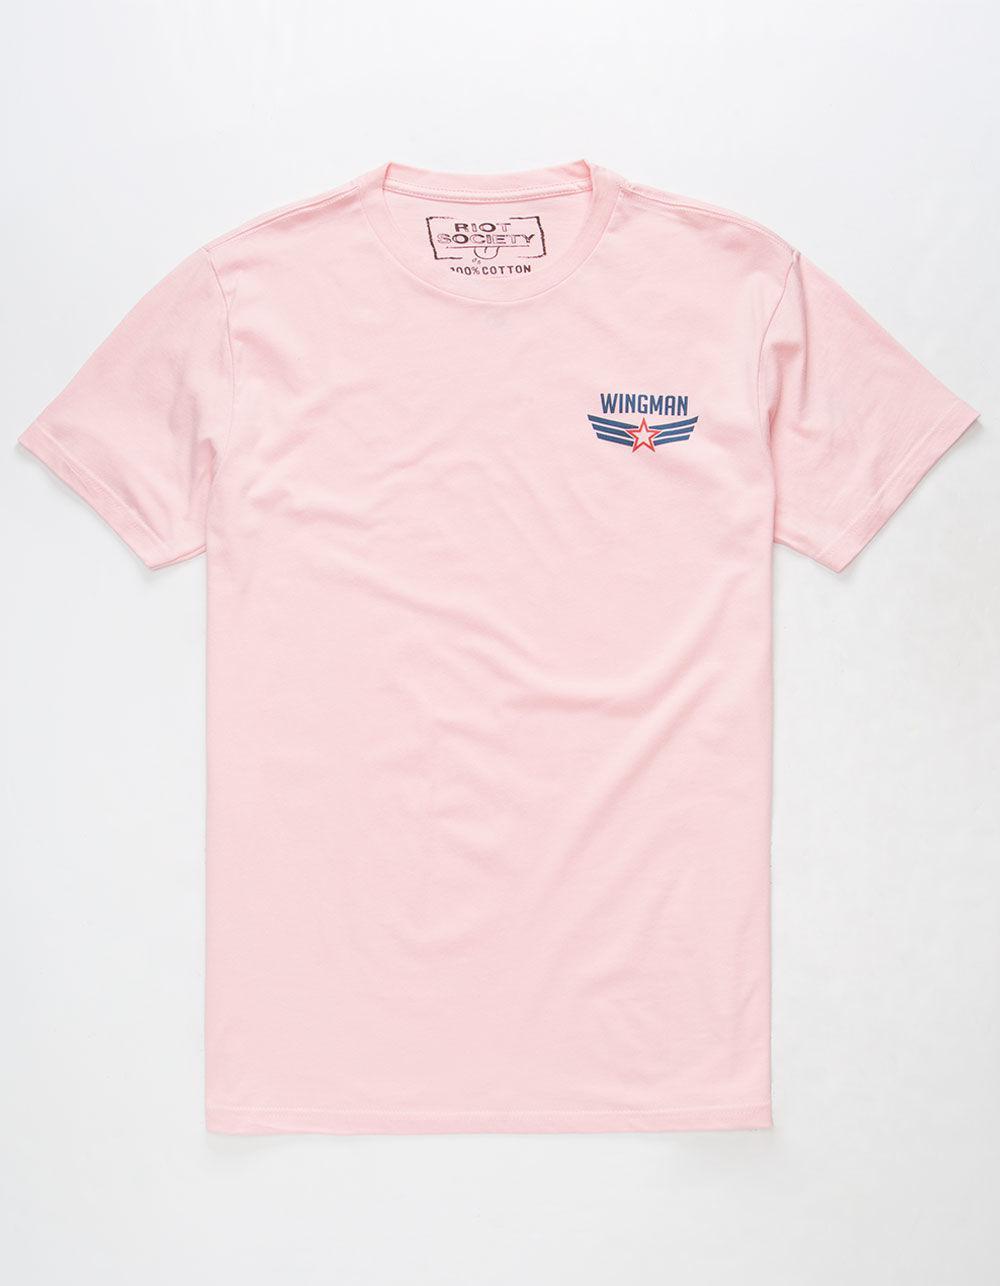 c3007f33b8 Riot Society Wingman Mens T-shirt in Pink for Men - Lyst